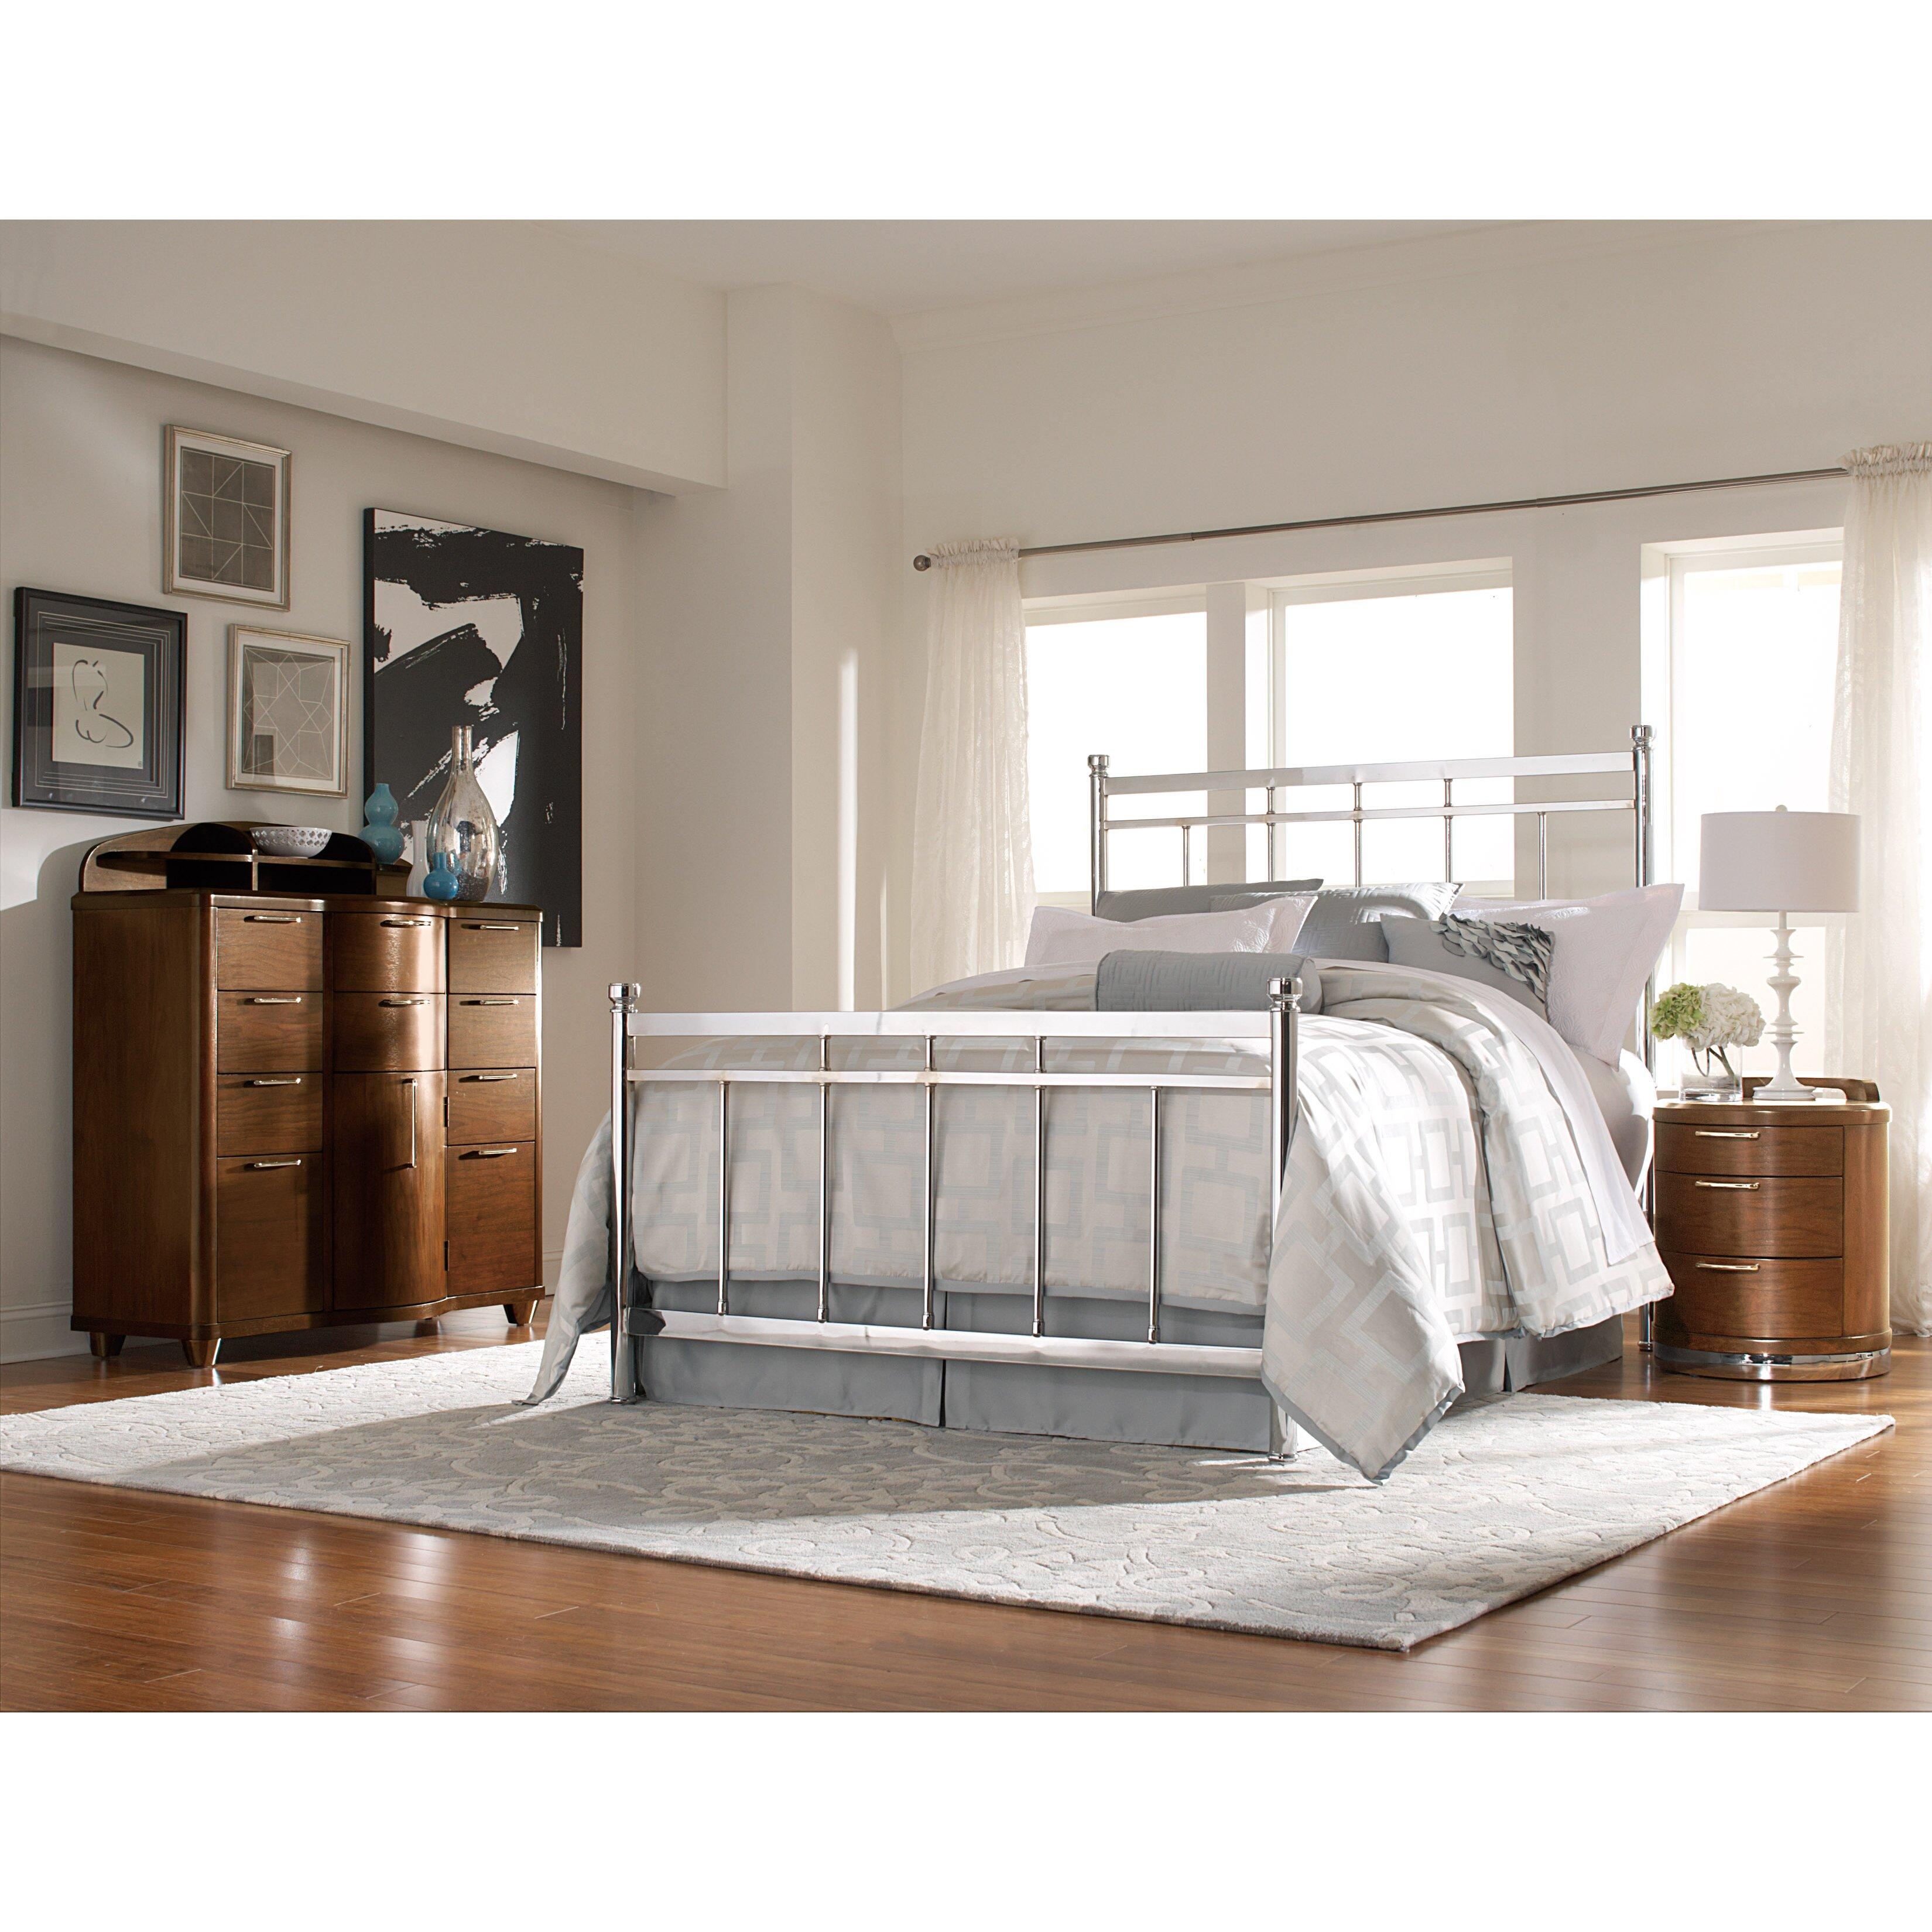 Ashley Furniture Woodbridge: Zelda Panel Bed